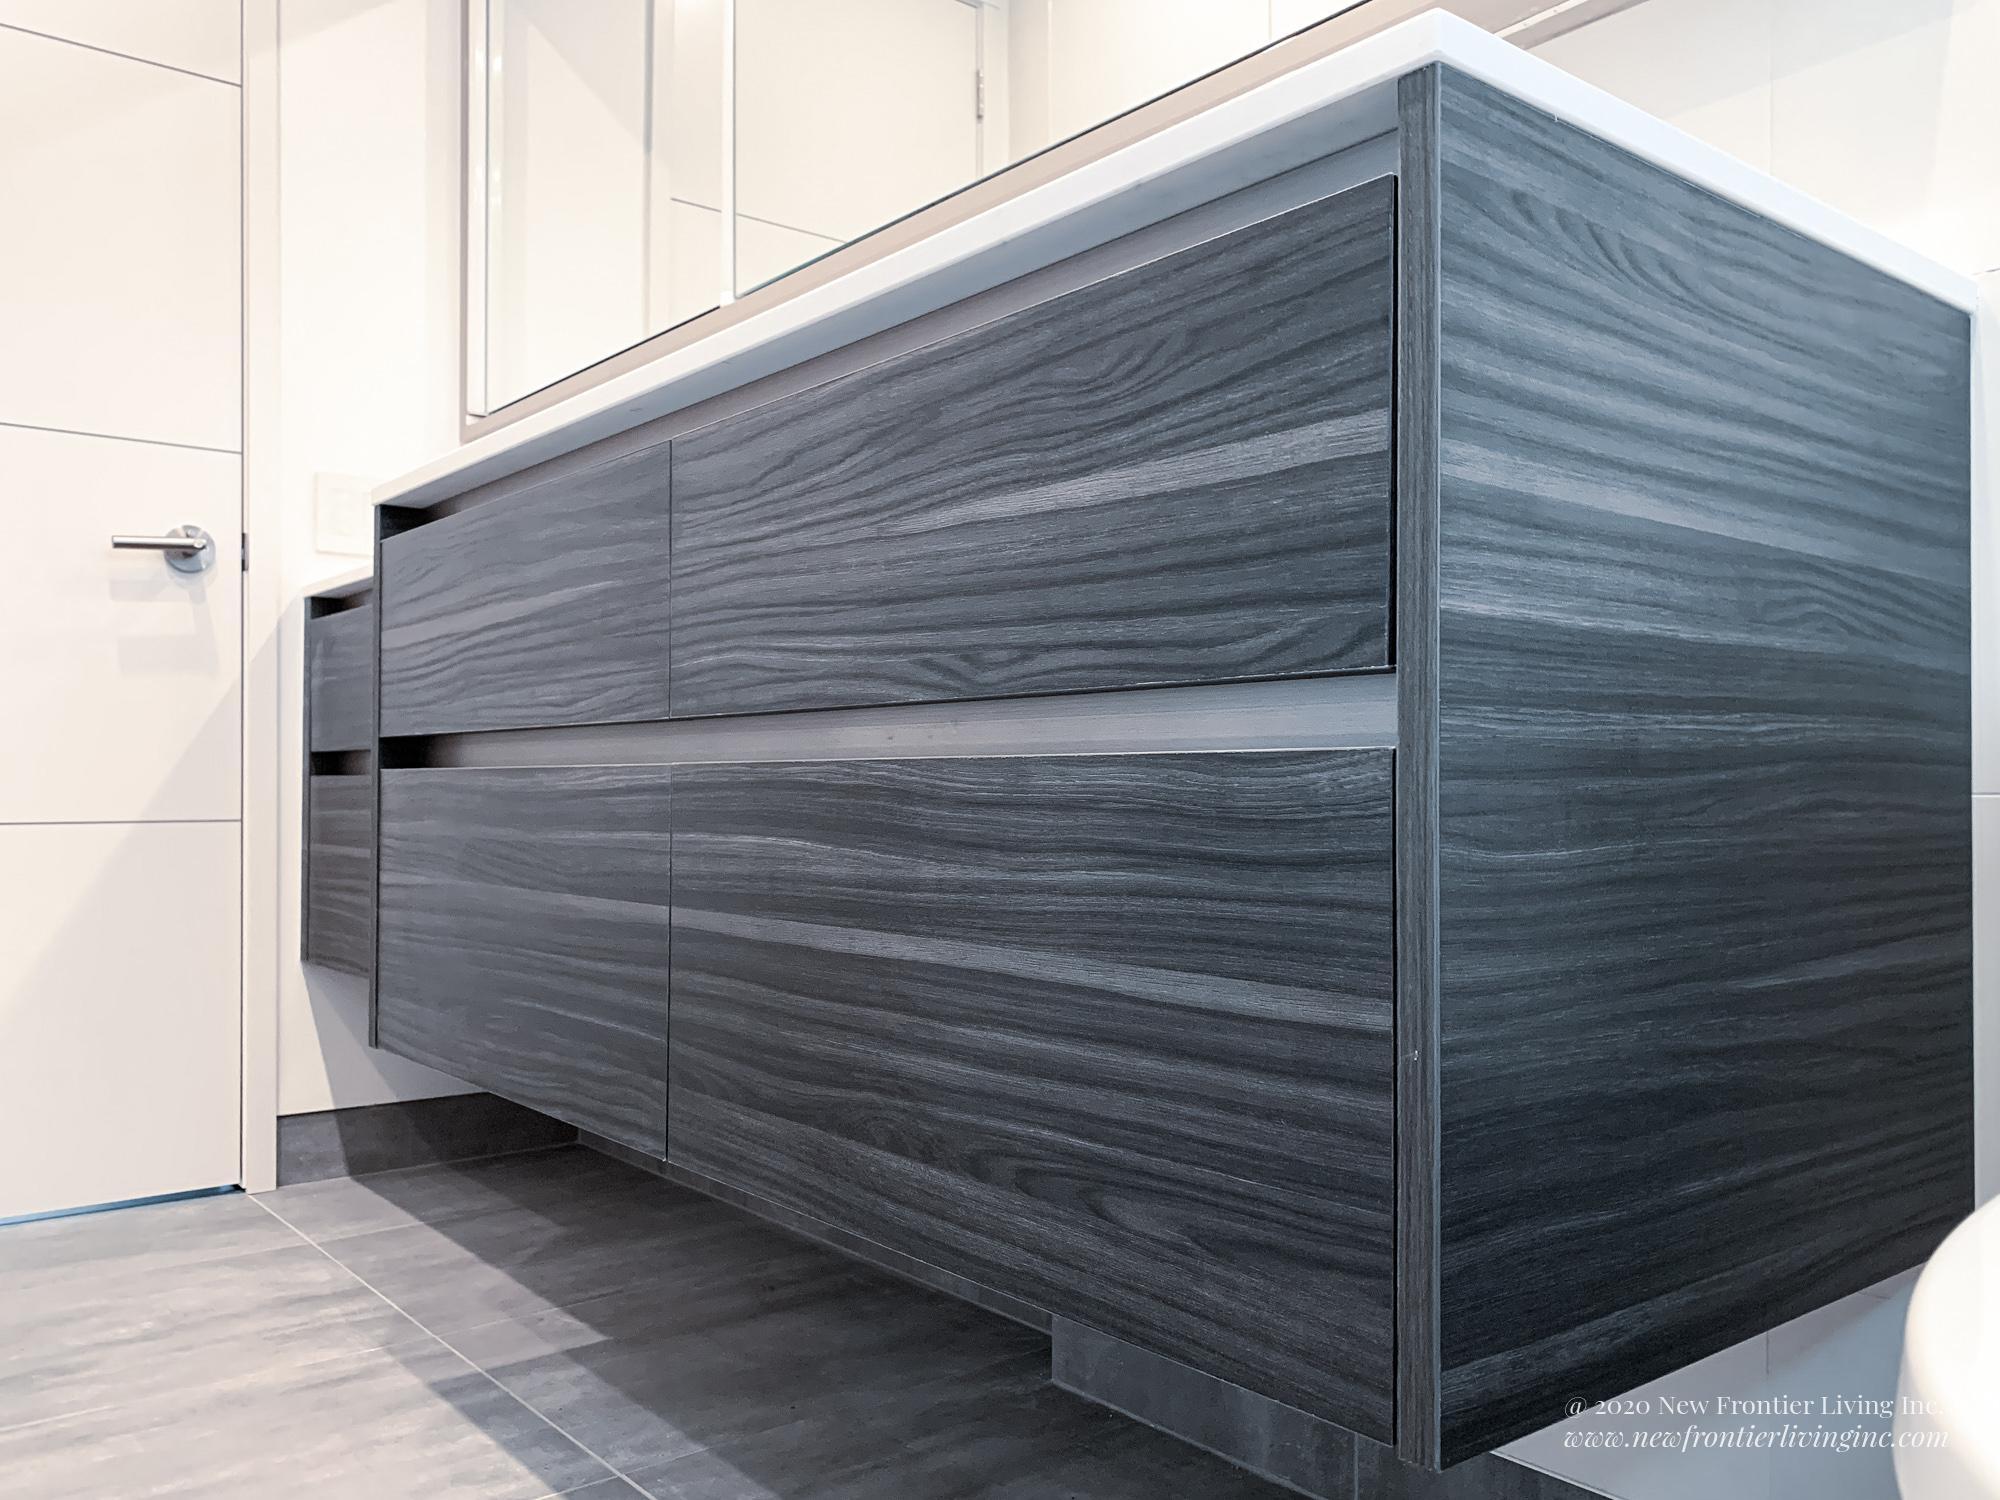 Close-up of dark gray bathroom vanity with white countertop